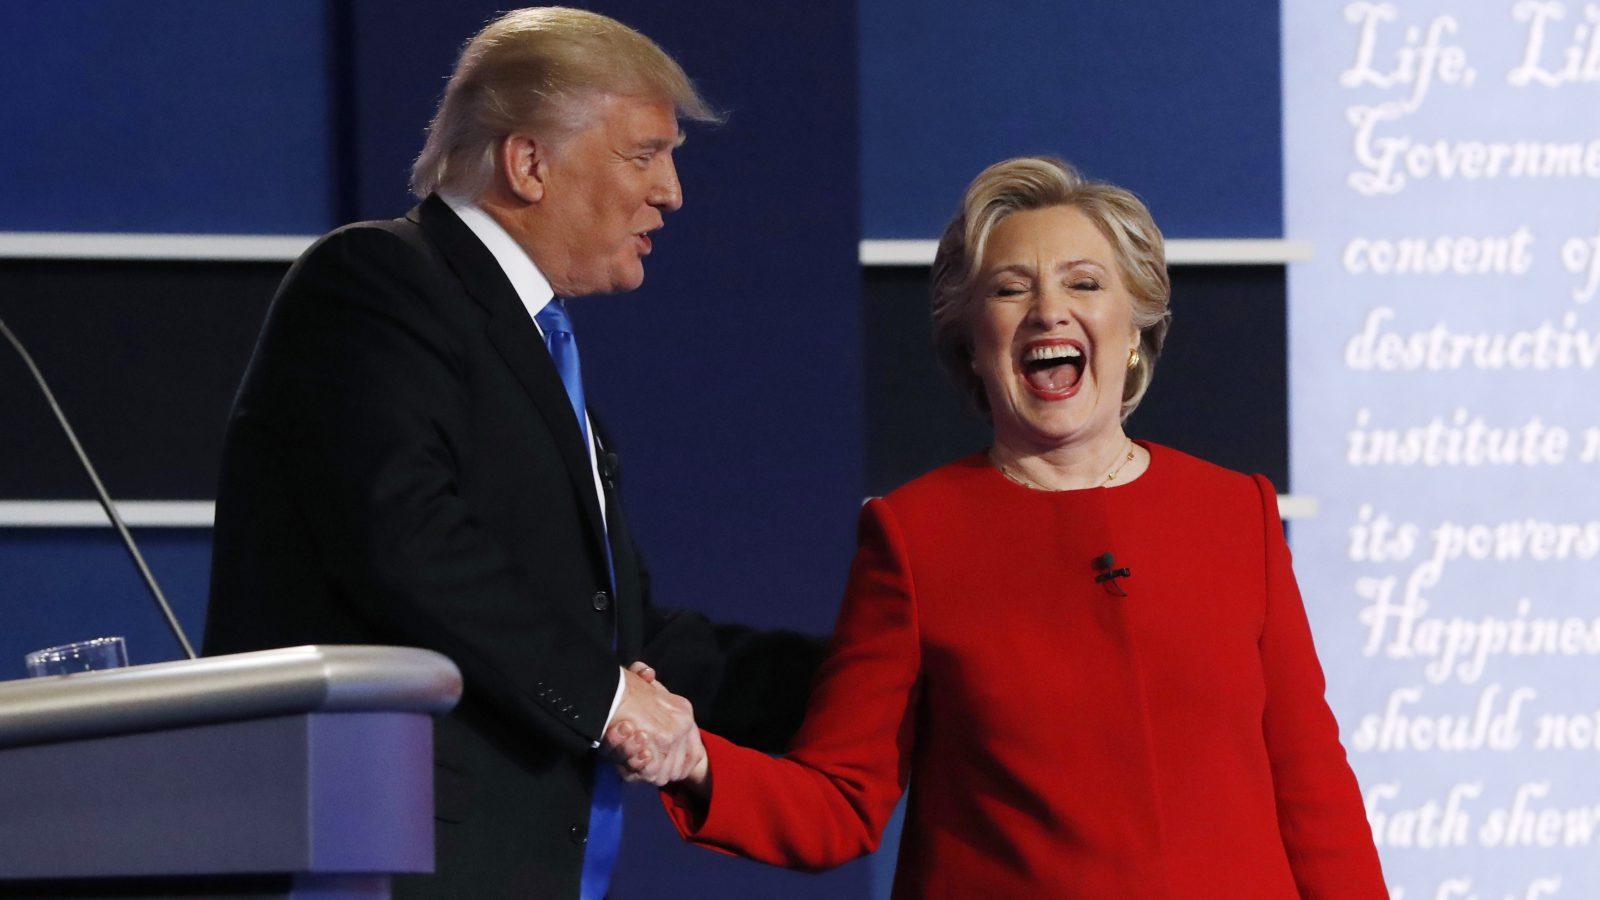 Hillary Clinton and Donald Trump talking.